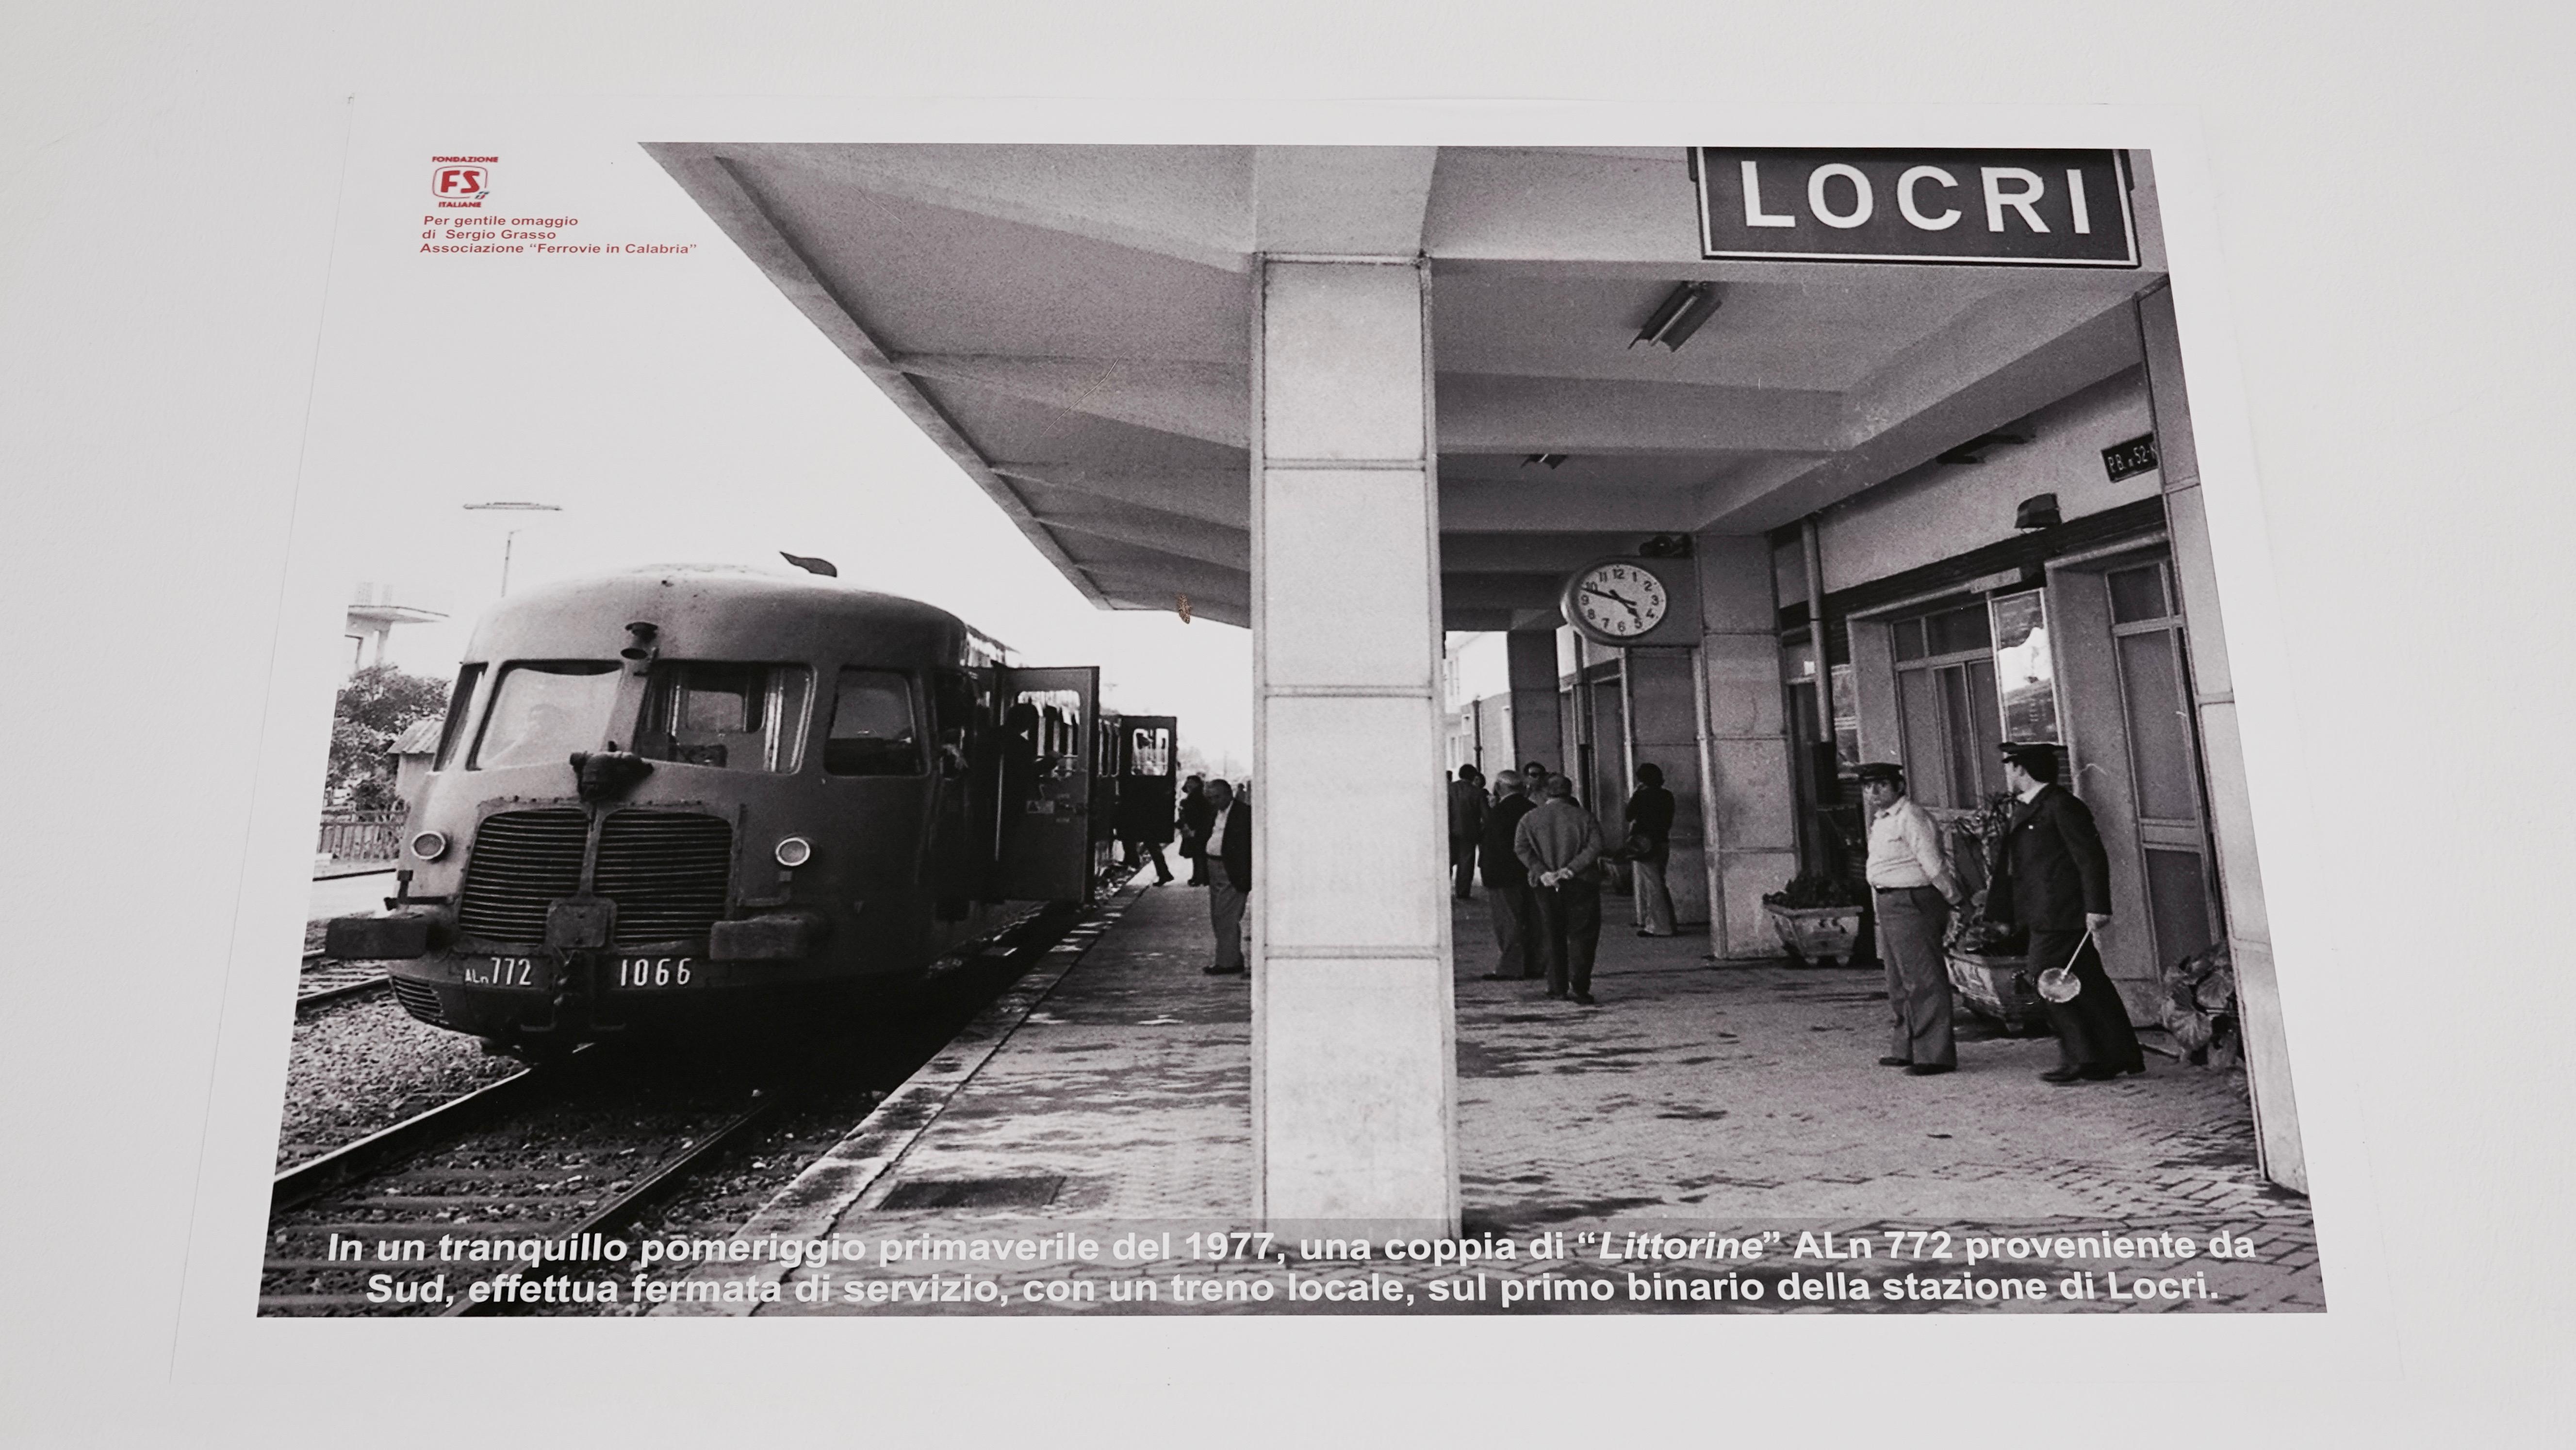 Stazione di Locri